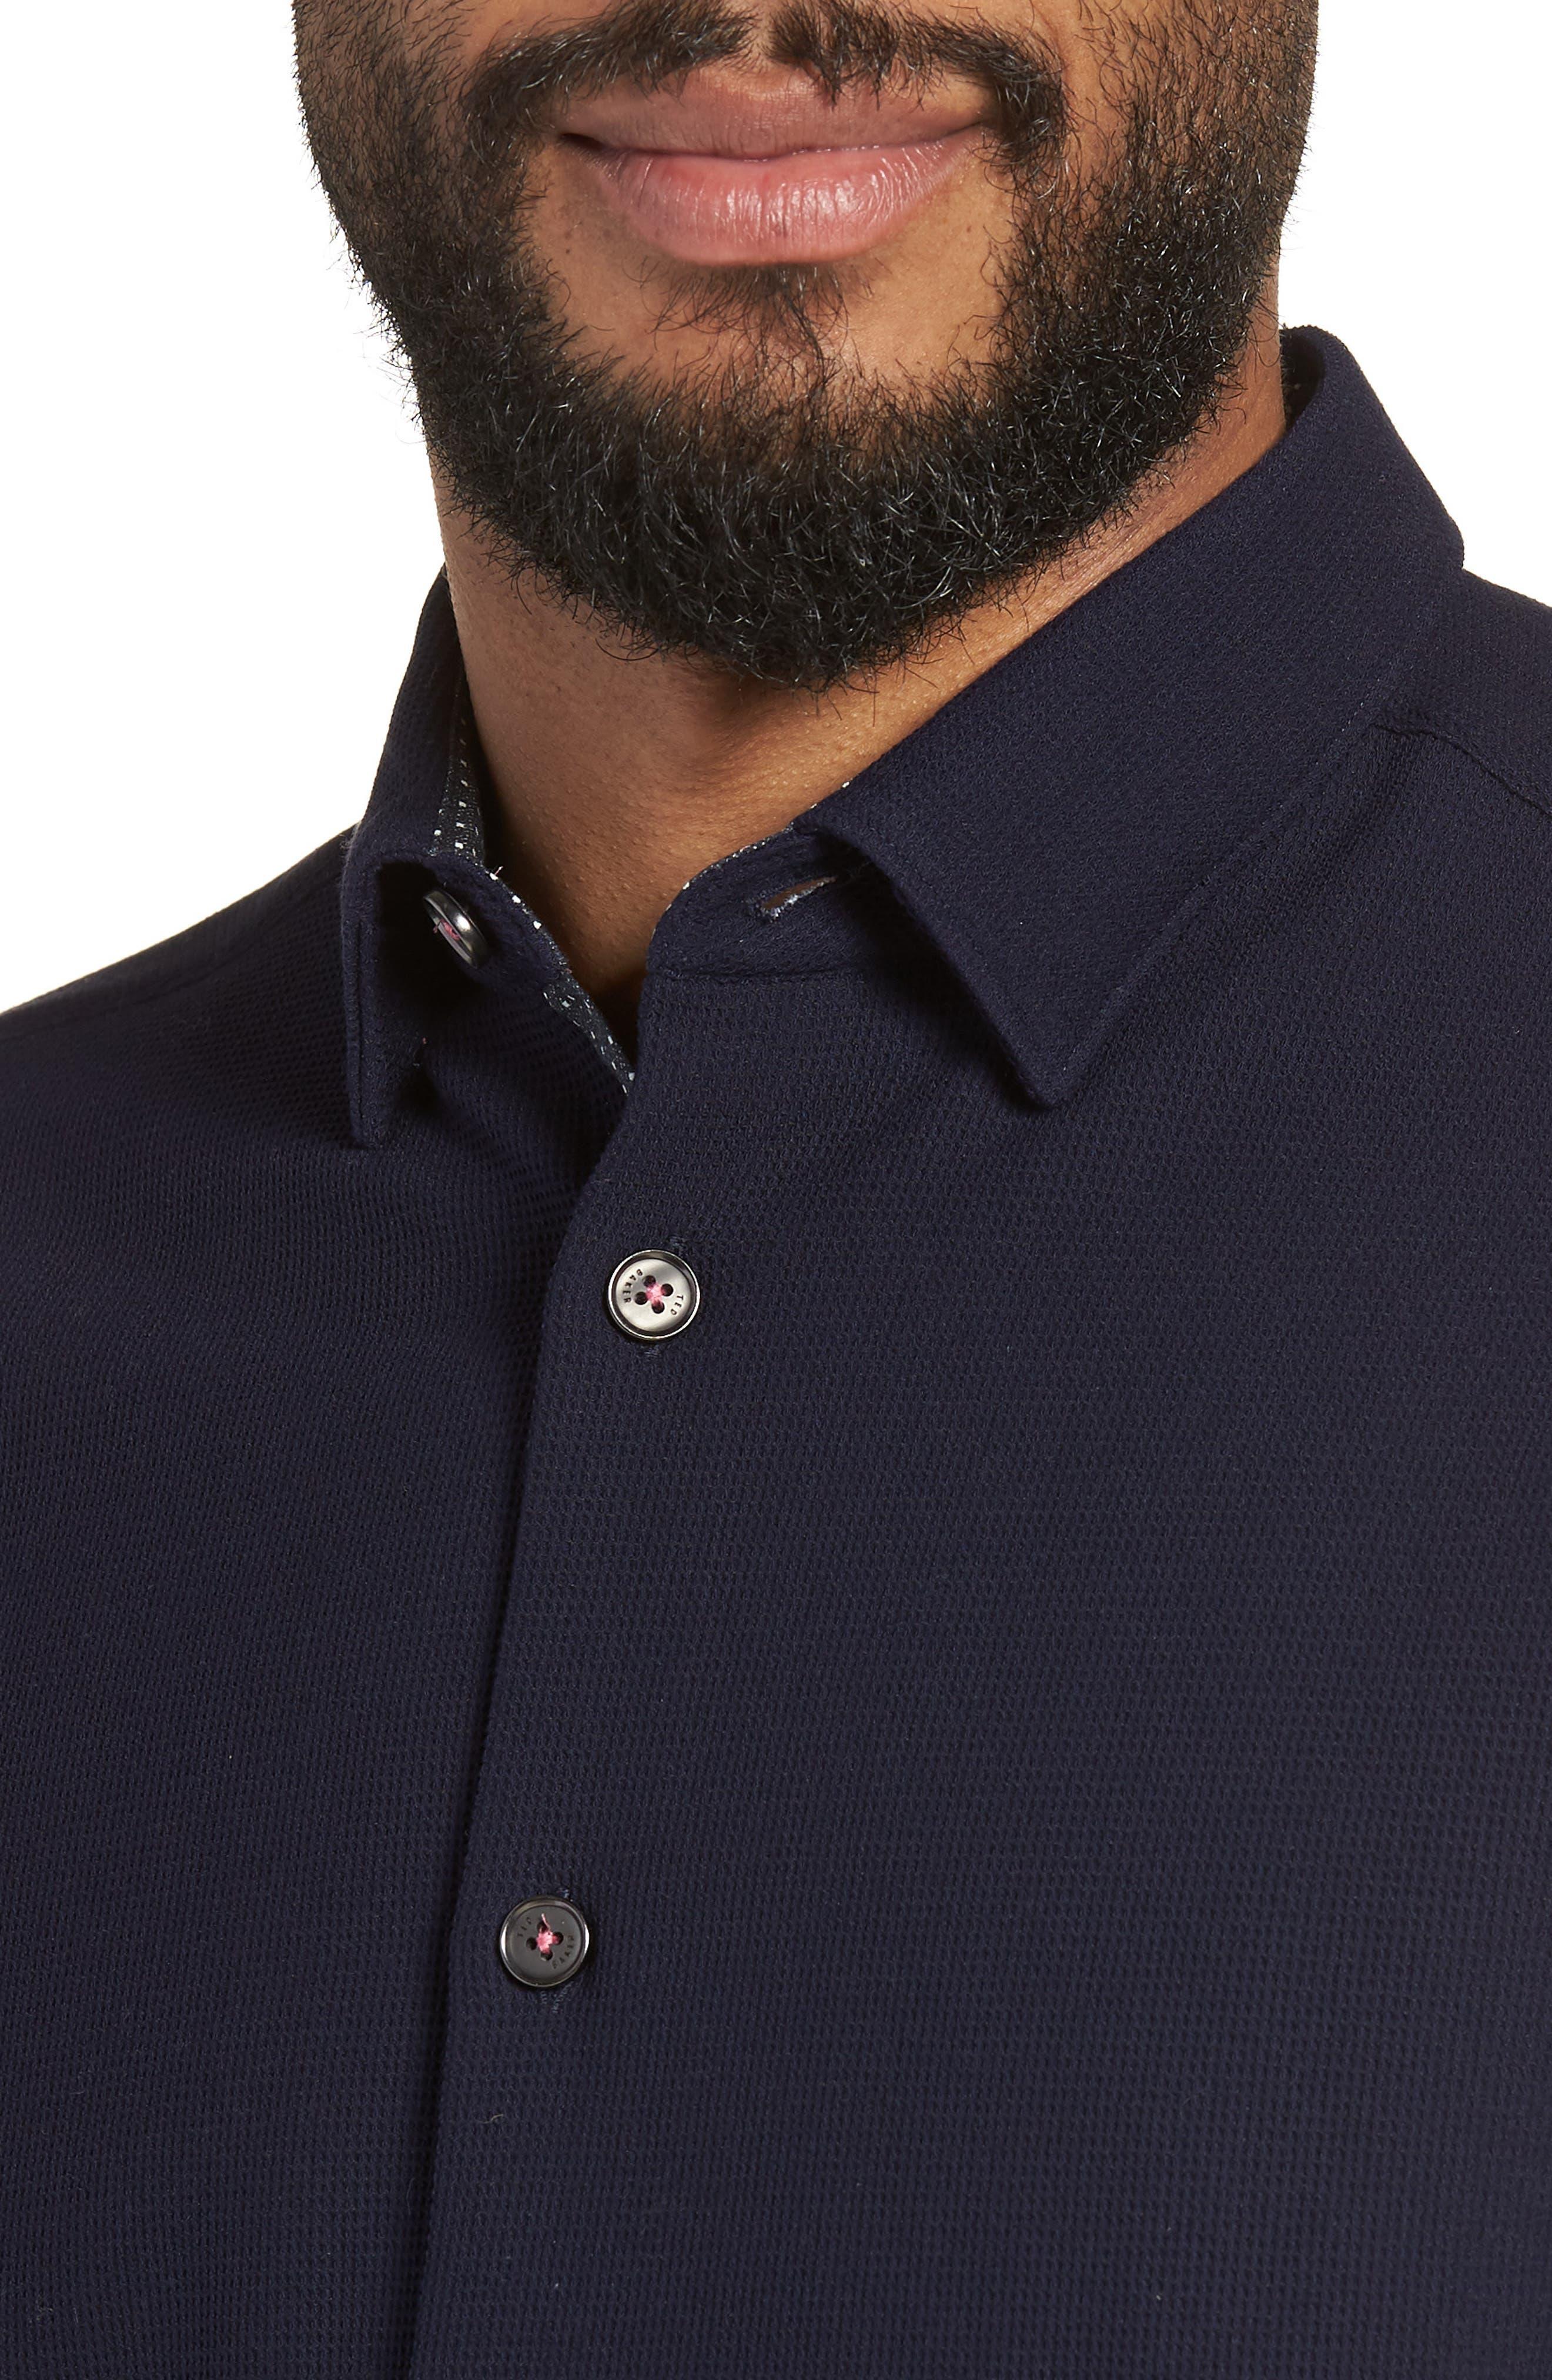 Loretax Trim Fit Stretch Knit Sport Shirt,                             Alternate thumbnail 4, color,